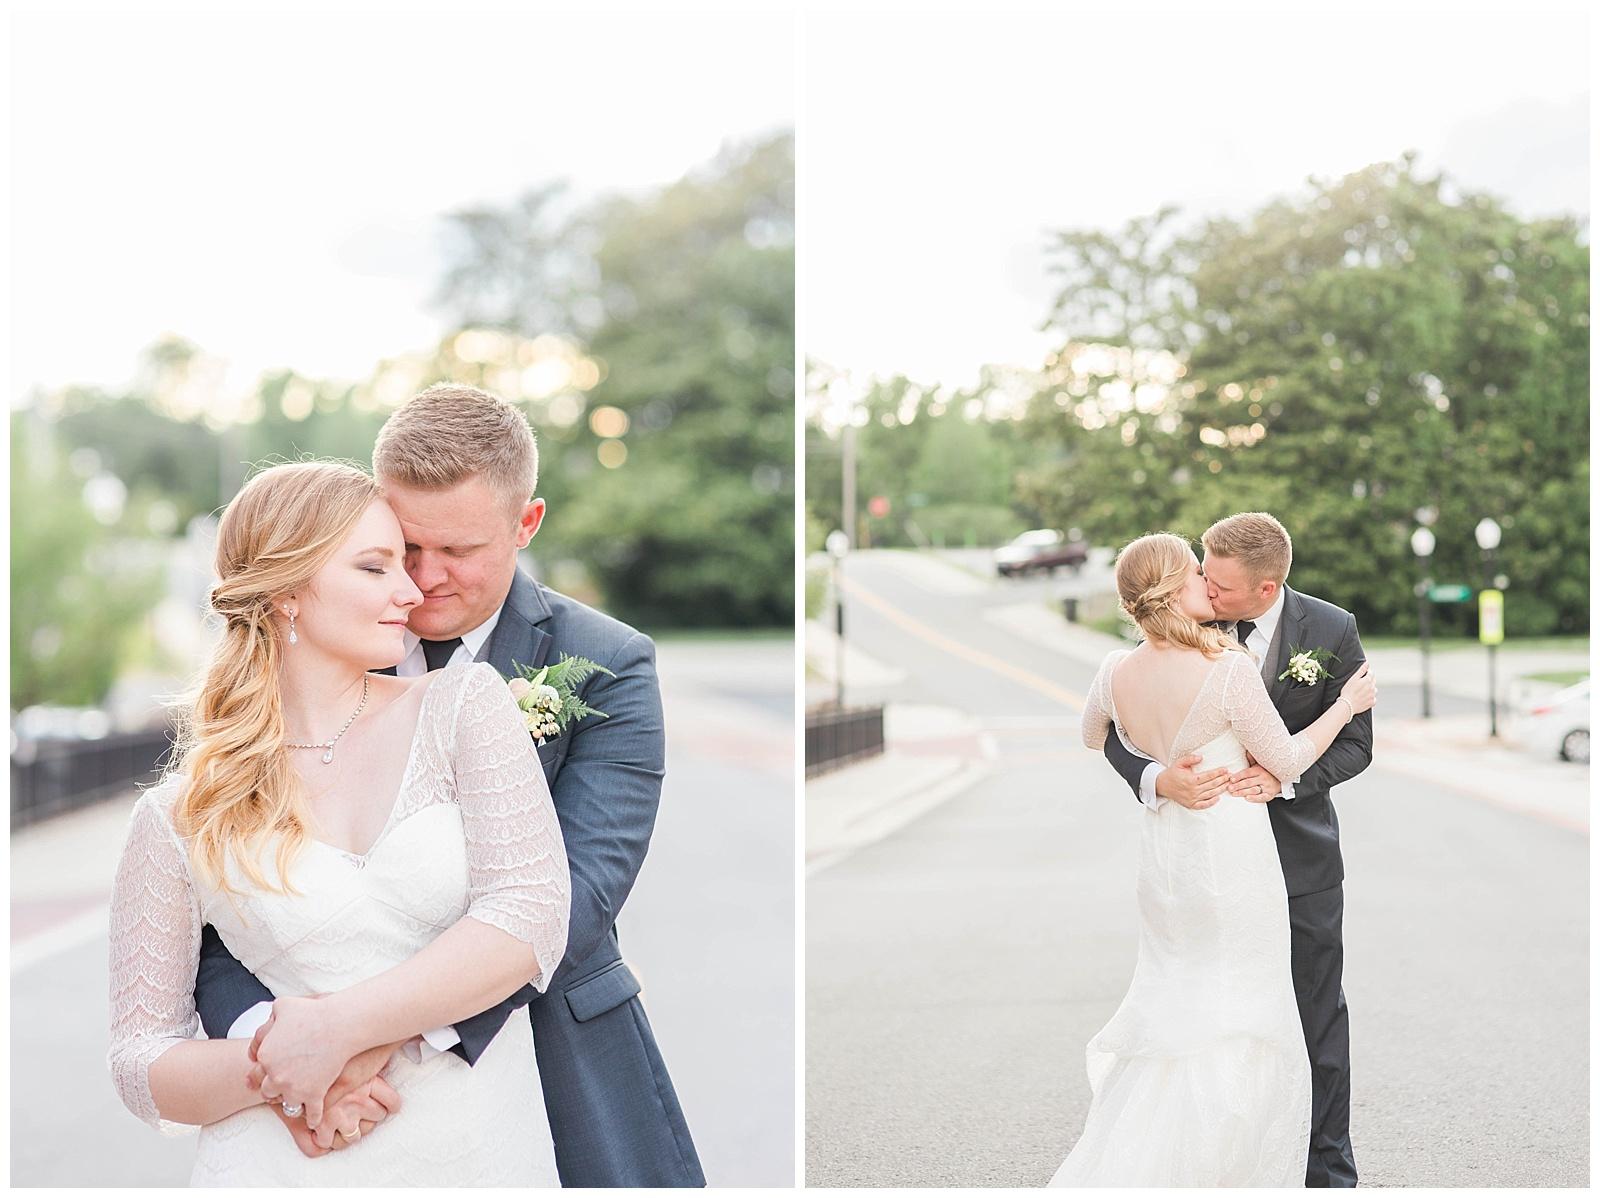 Bairdwedding_Acworth_TheConservatory-KaraBlakemanphotography_2017_10